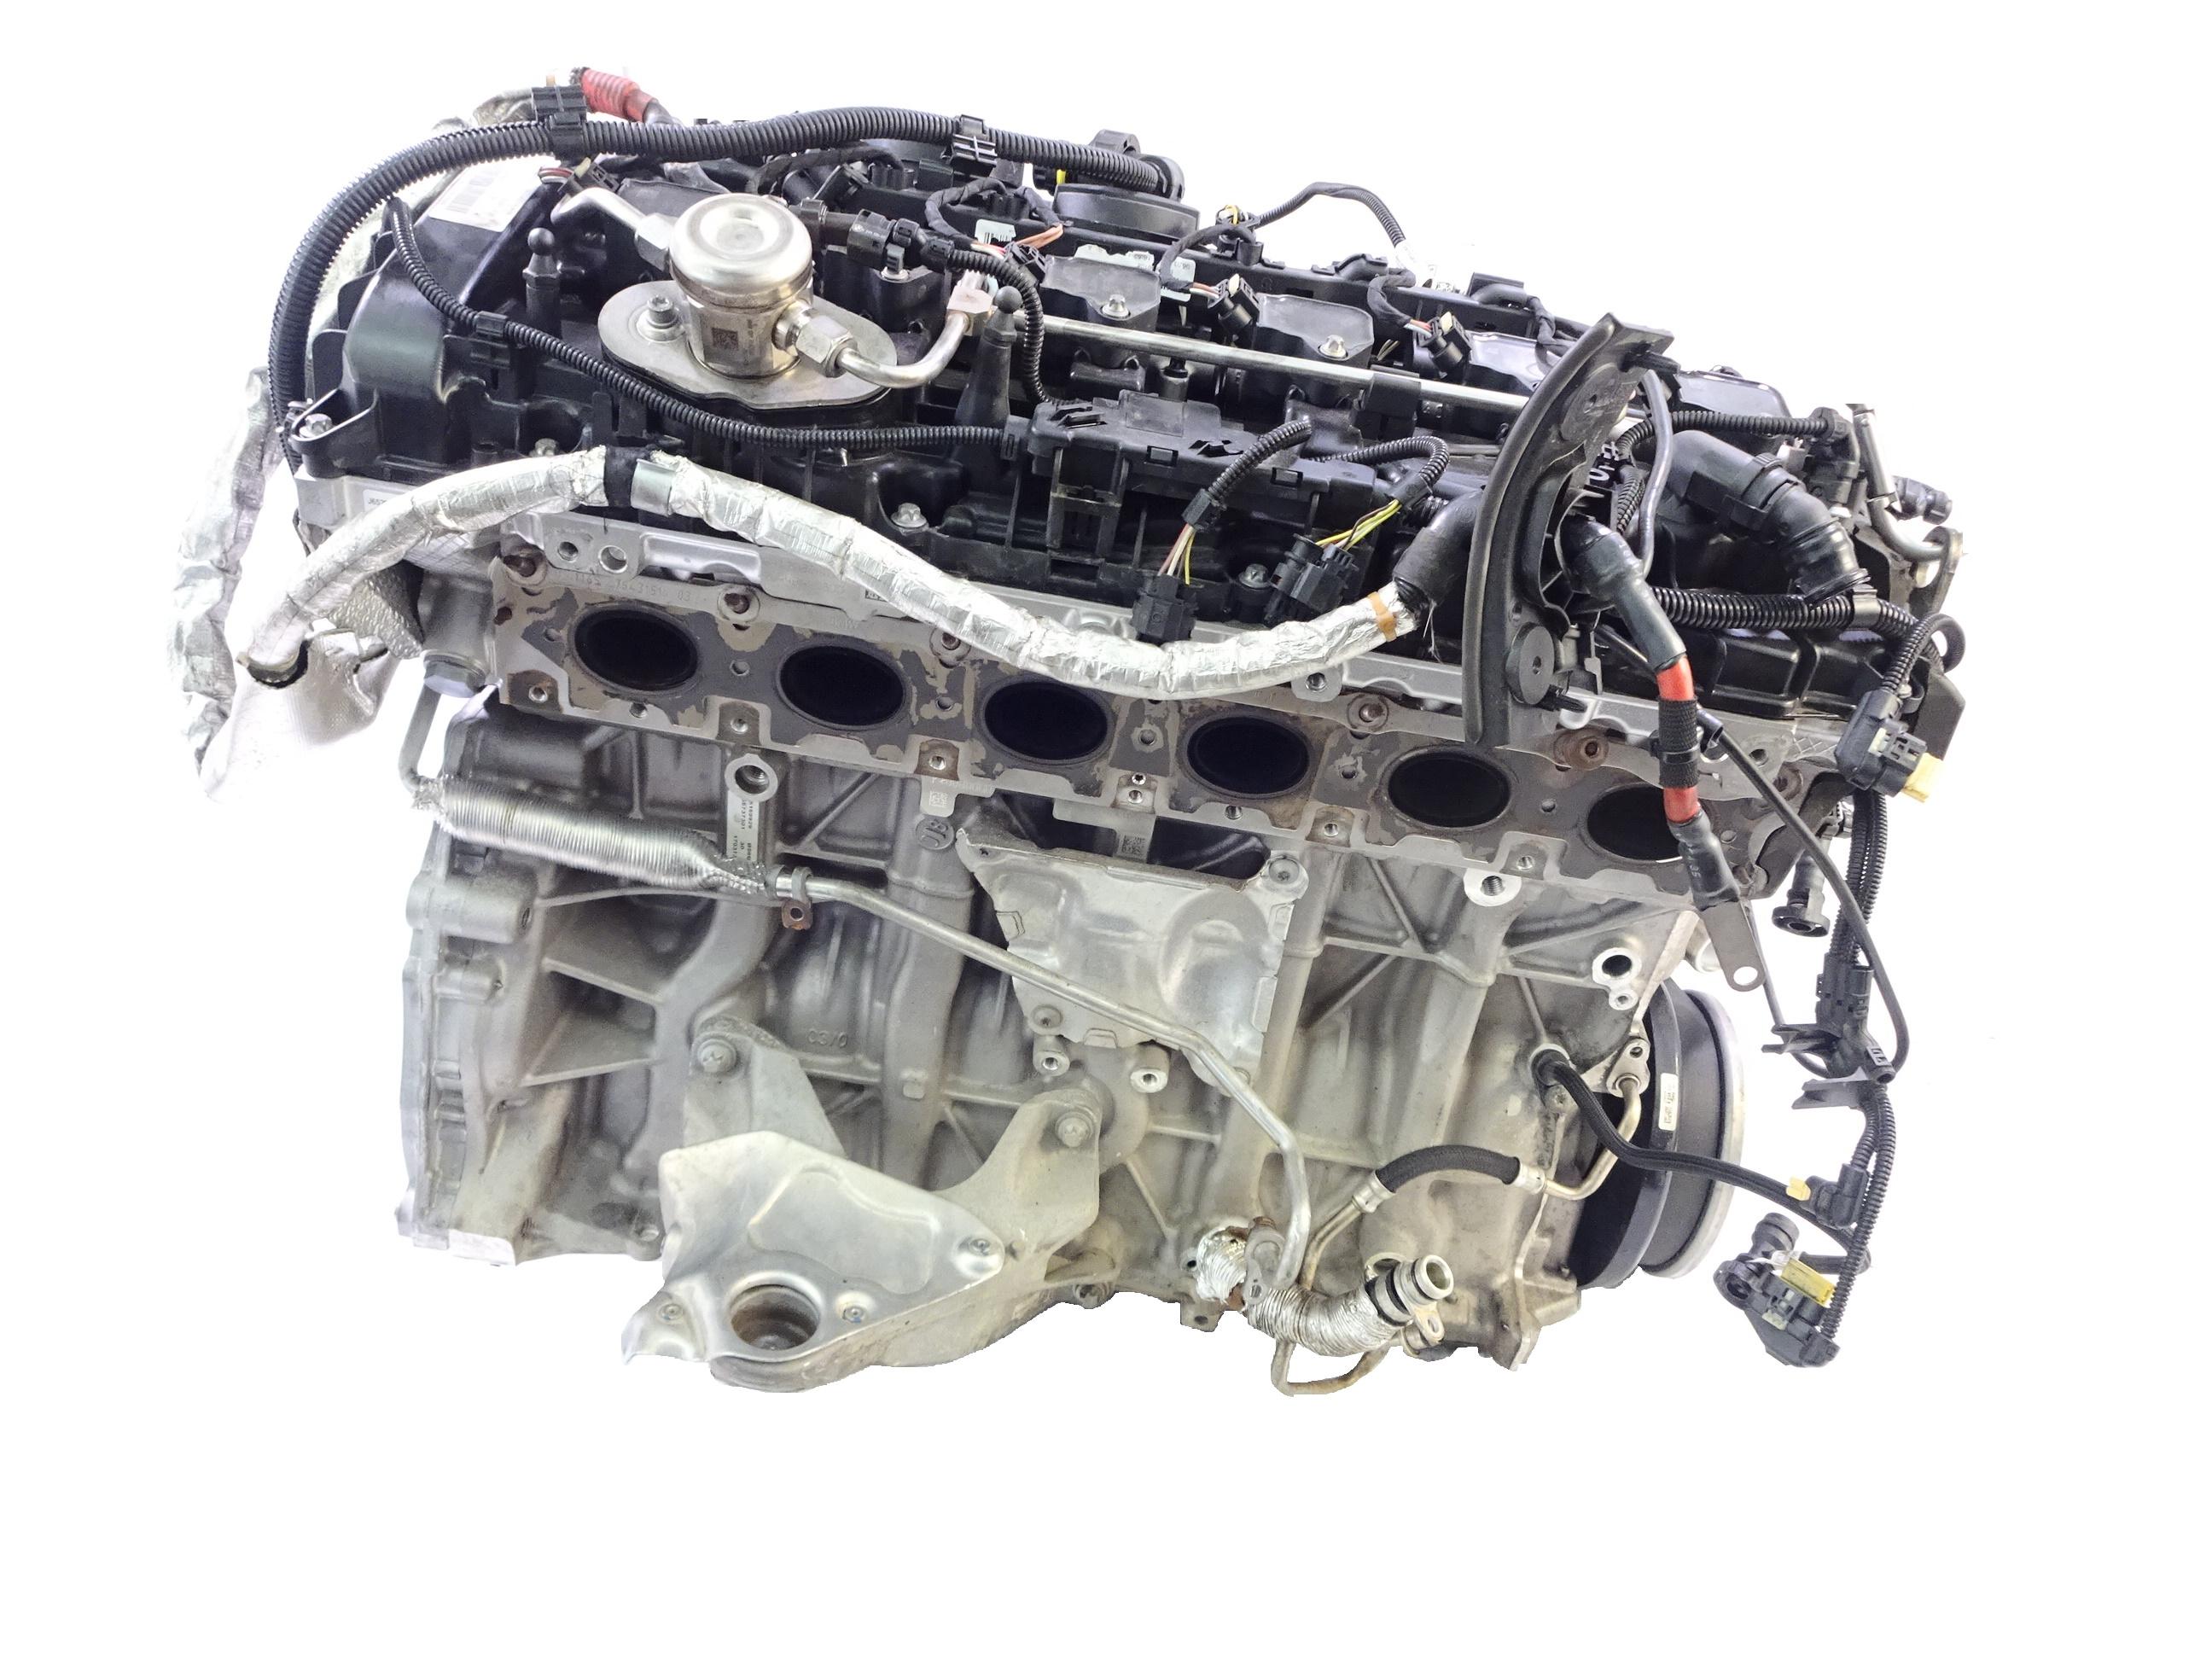 Motor 2016 BMW F30 F31 F32 F33 F34 F35 F36 340i 440i 3,0 B58 B58B30A 326 PS